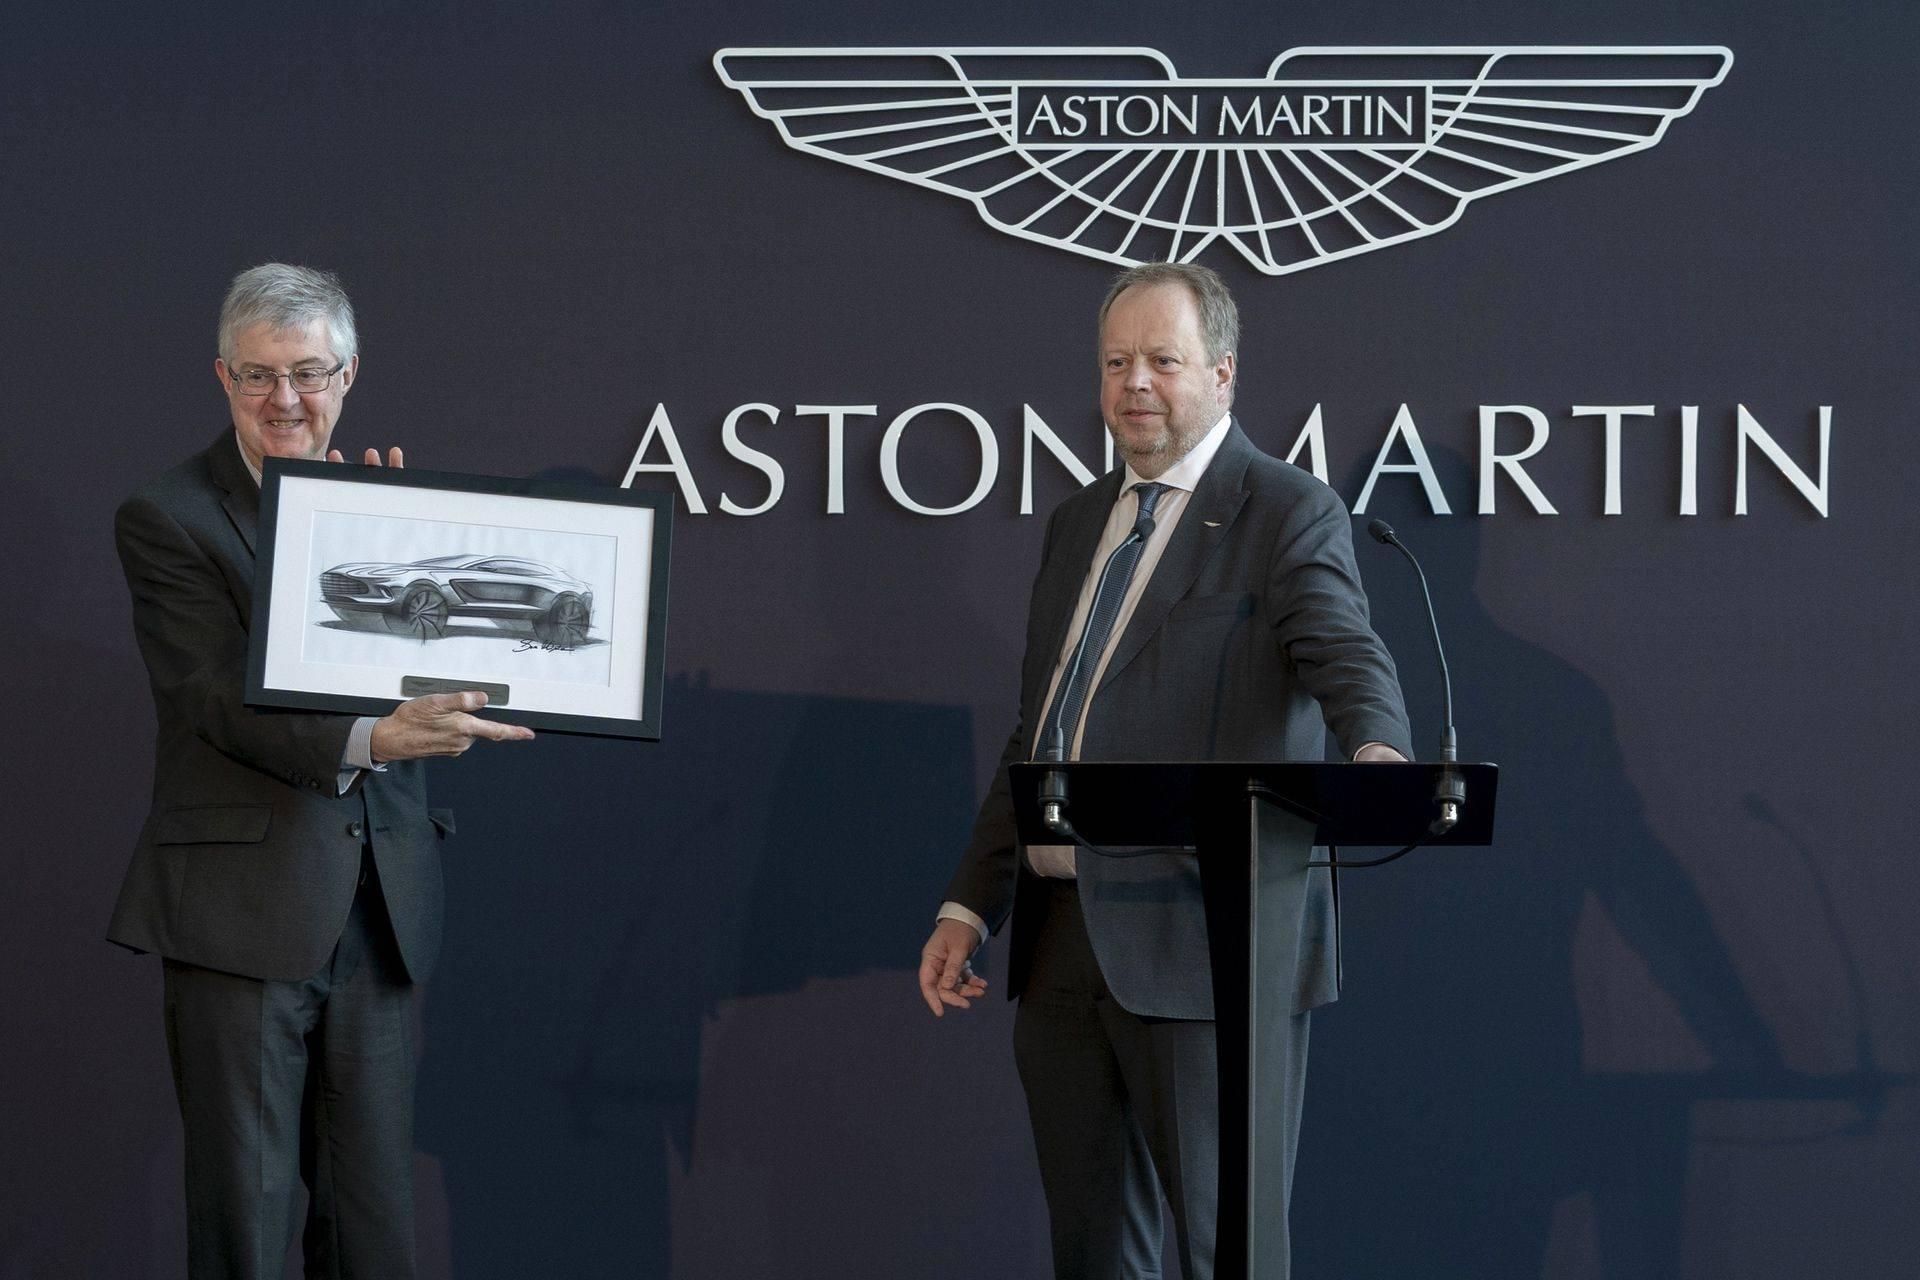 Aston_Martin_St_Athan_0010